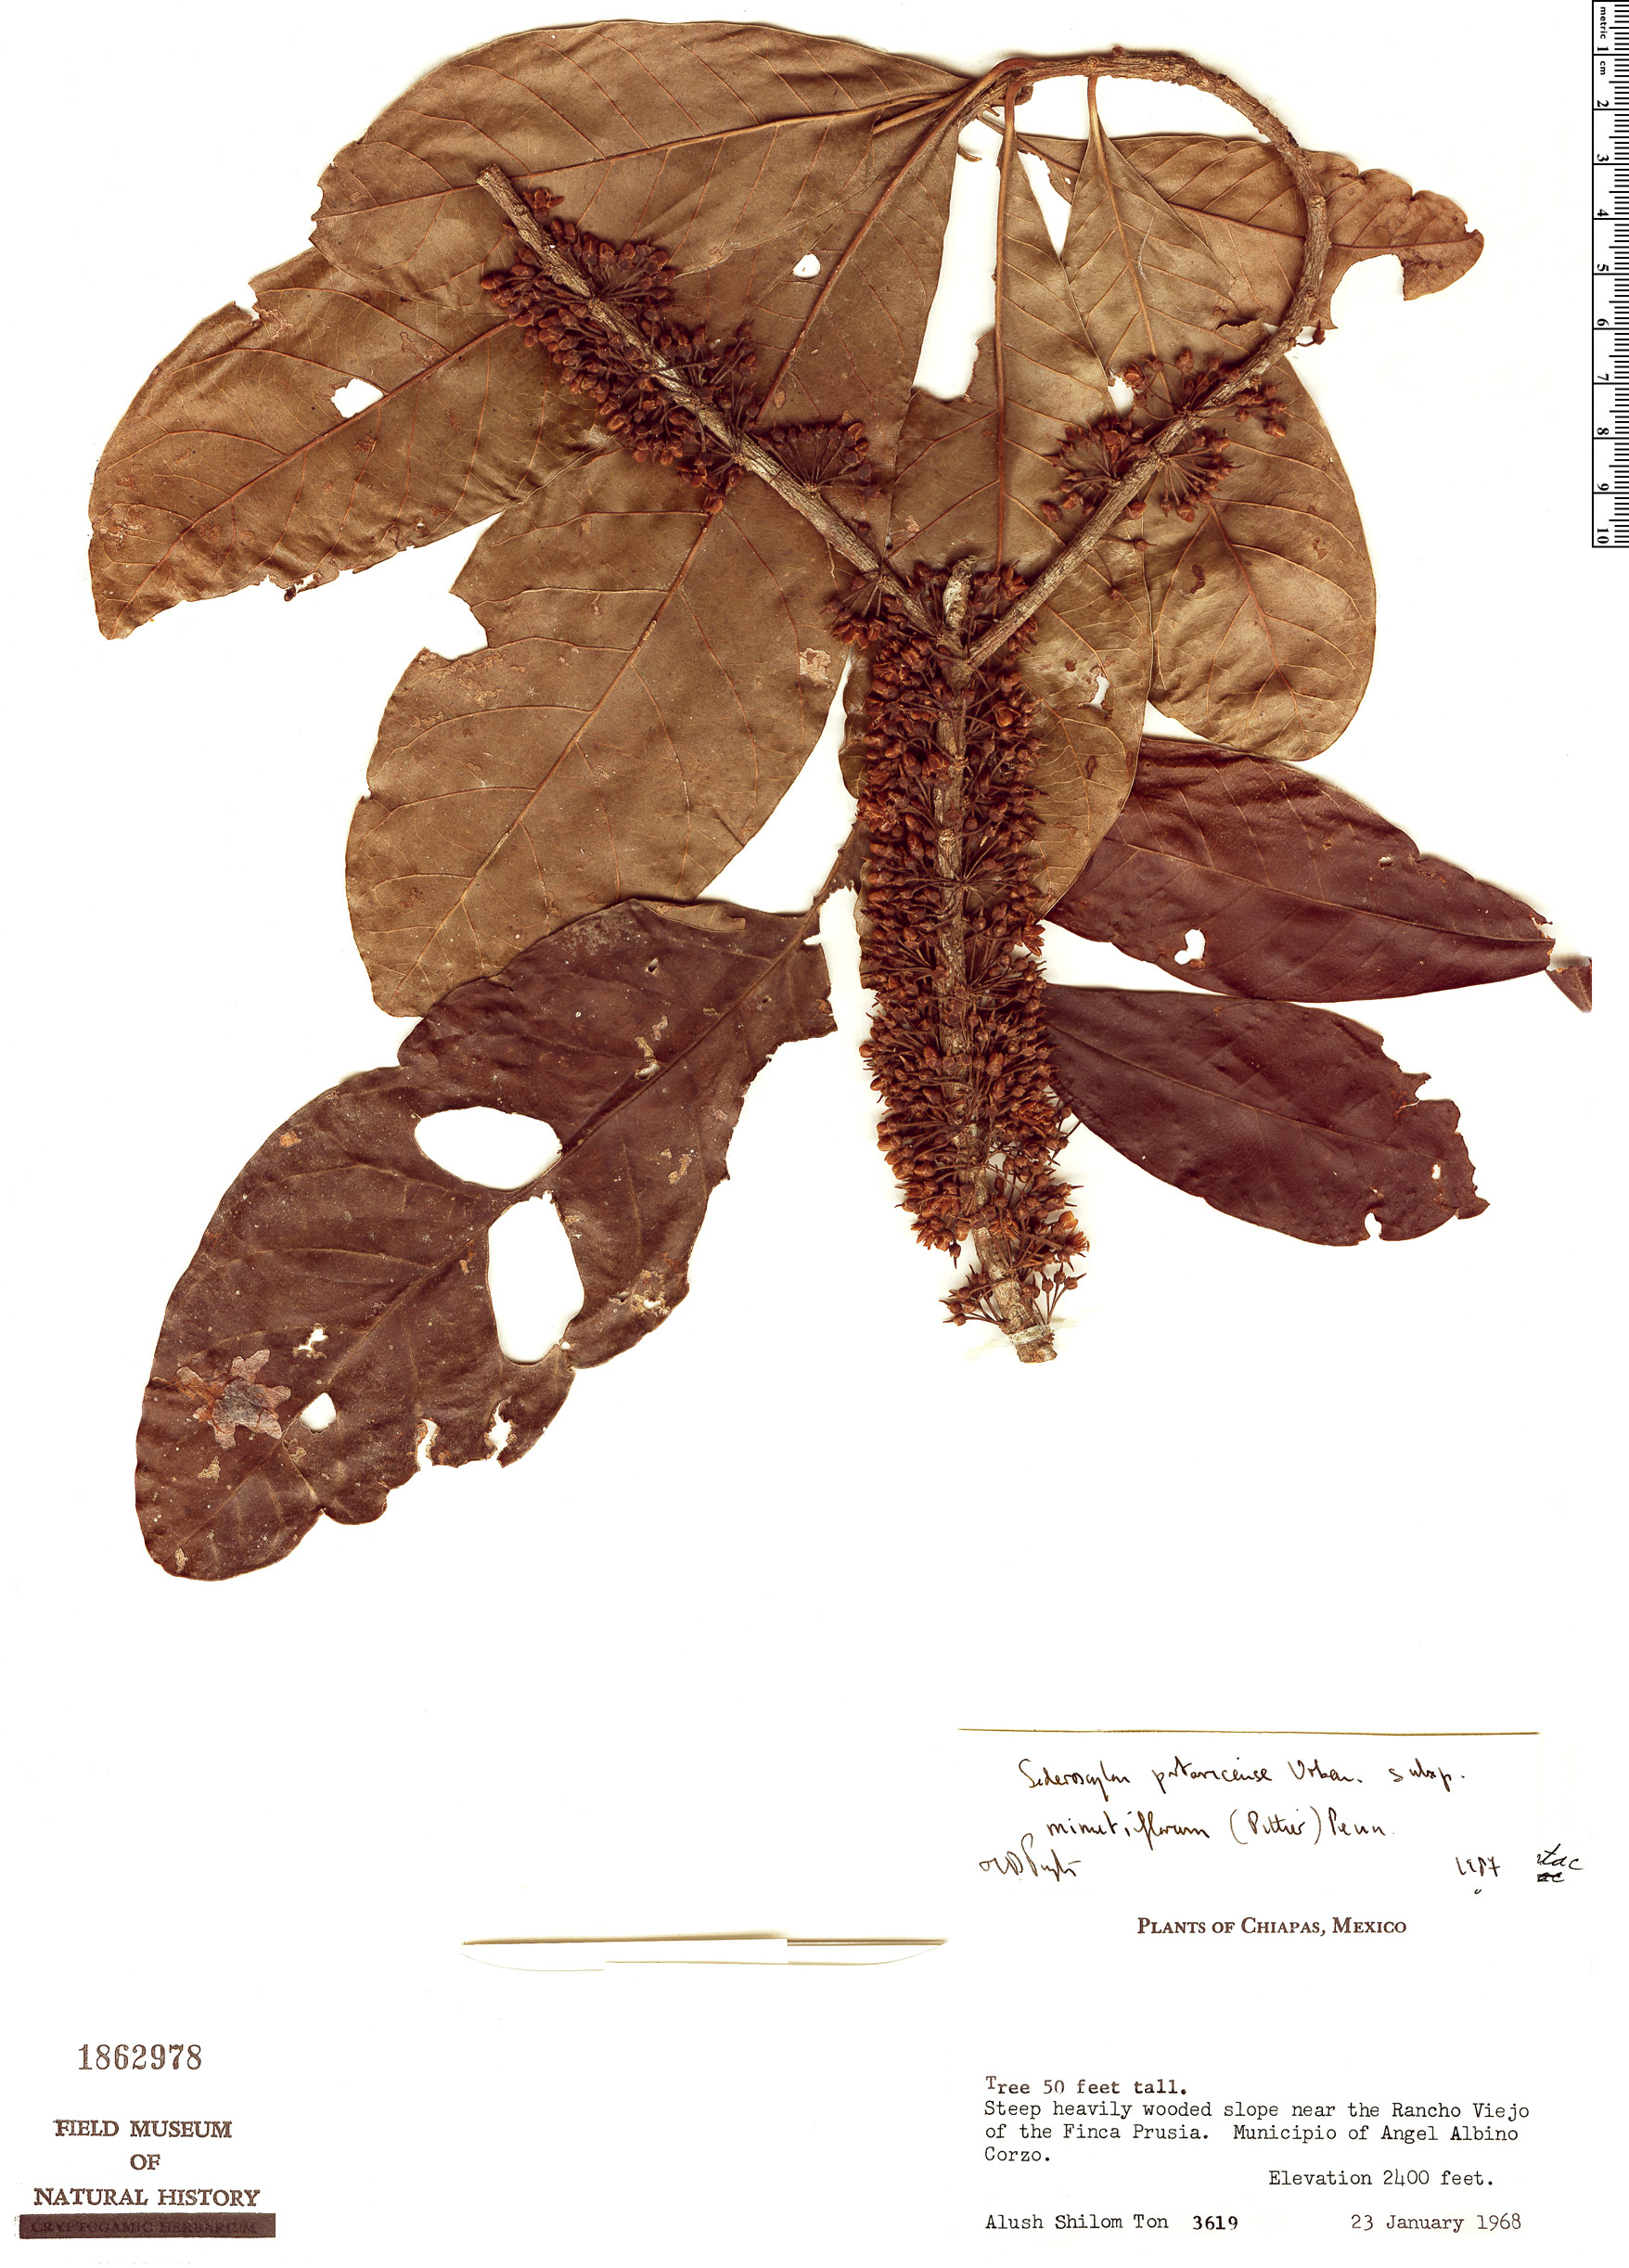 Specimen: Sideroxylon portoricense